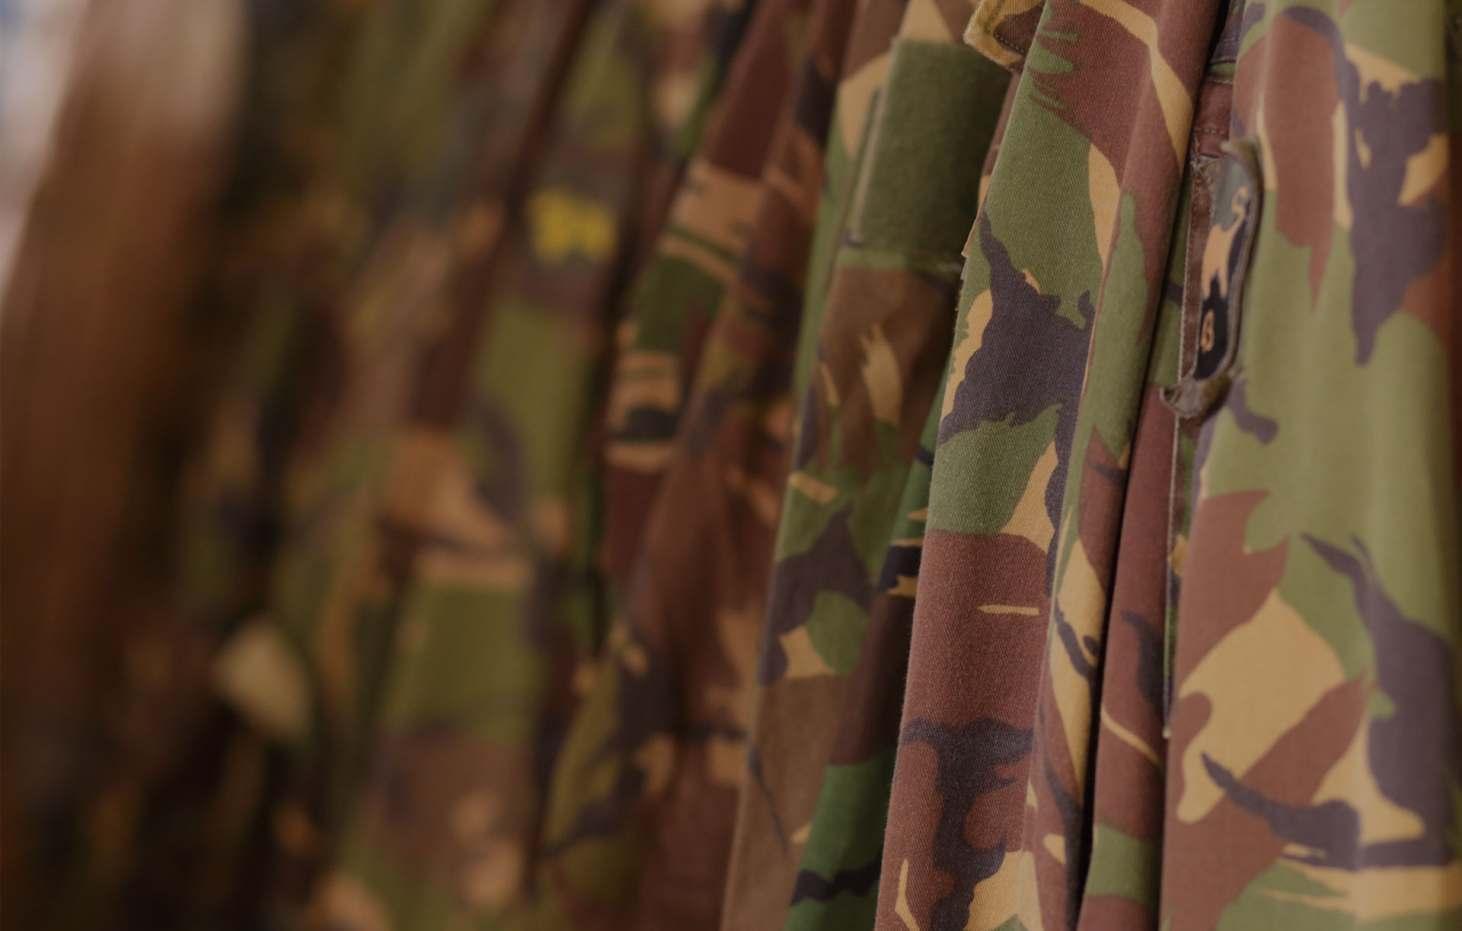 koekman militaire uniformen